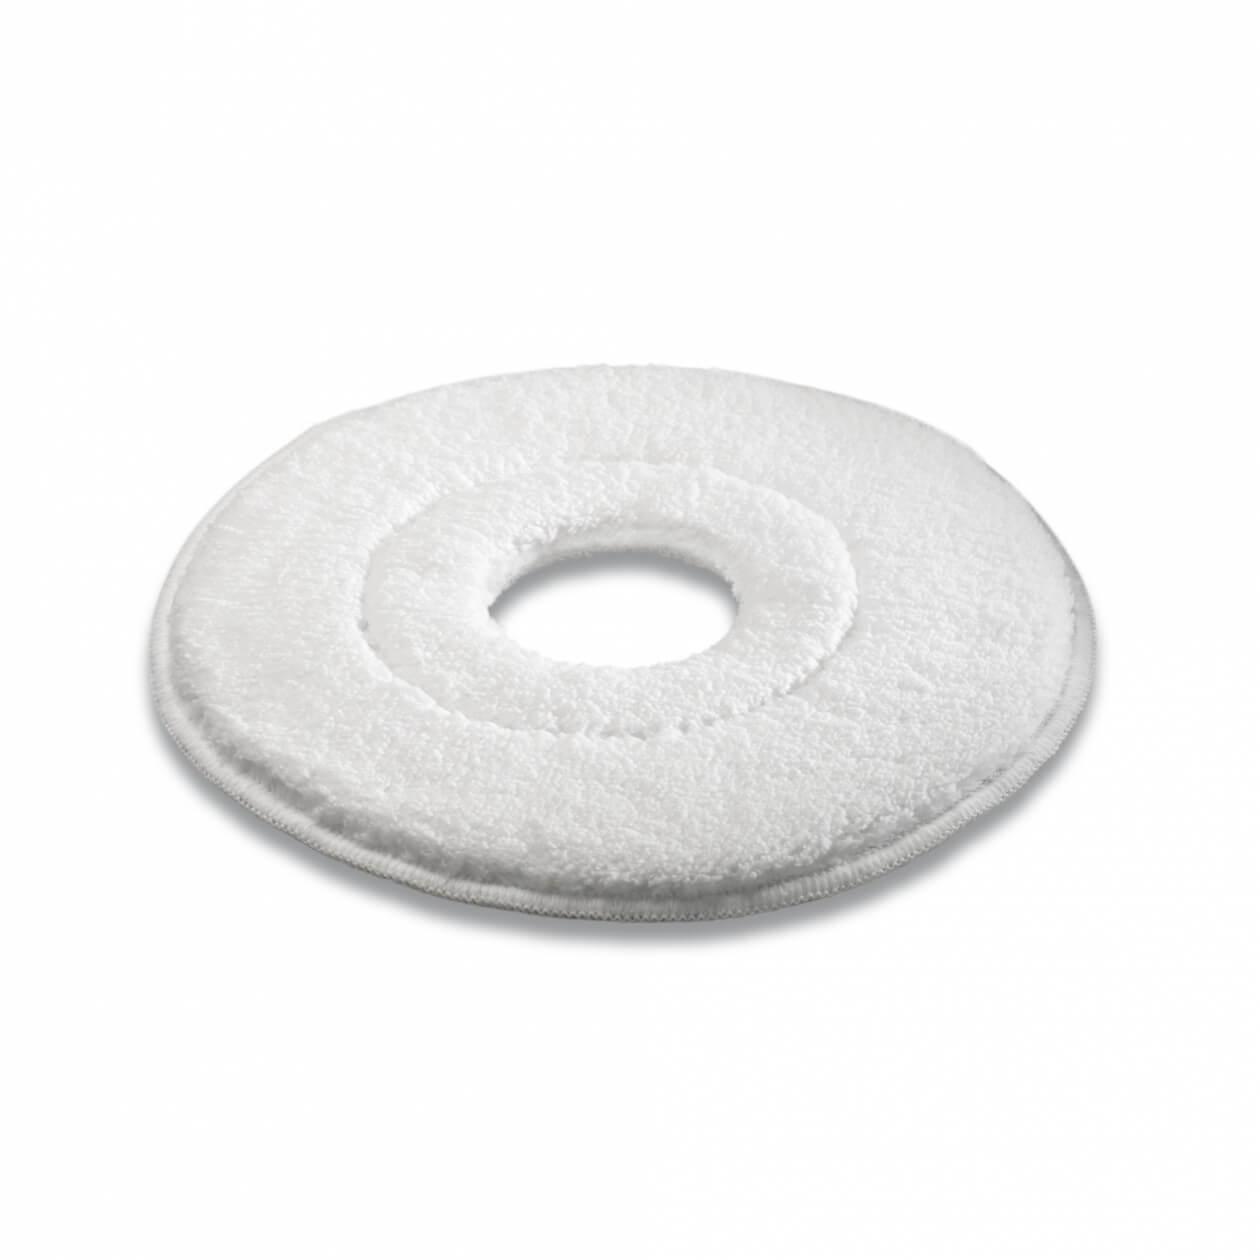 Kärcher, mikrofiber pads, hvid, 533 mm, 5 stk.